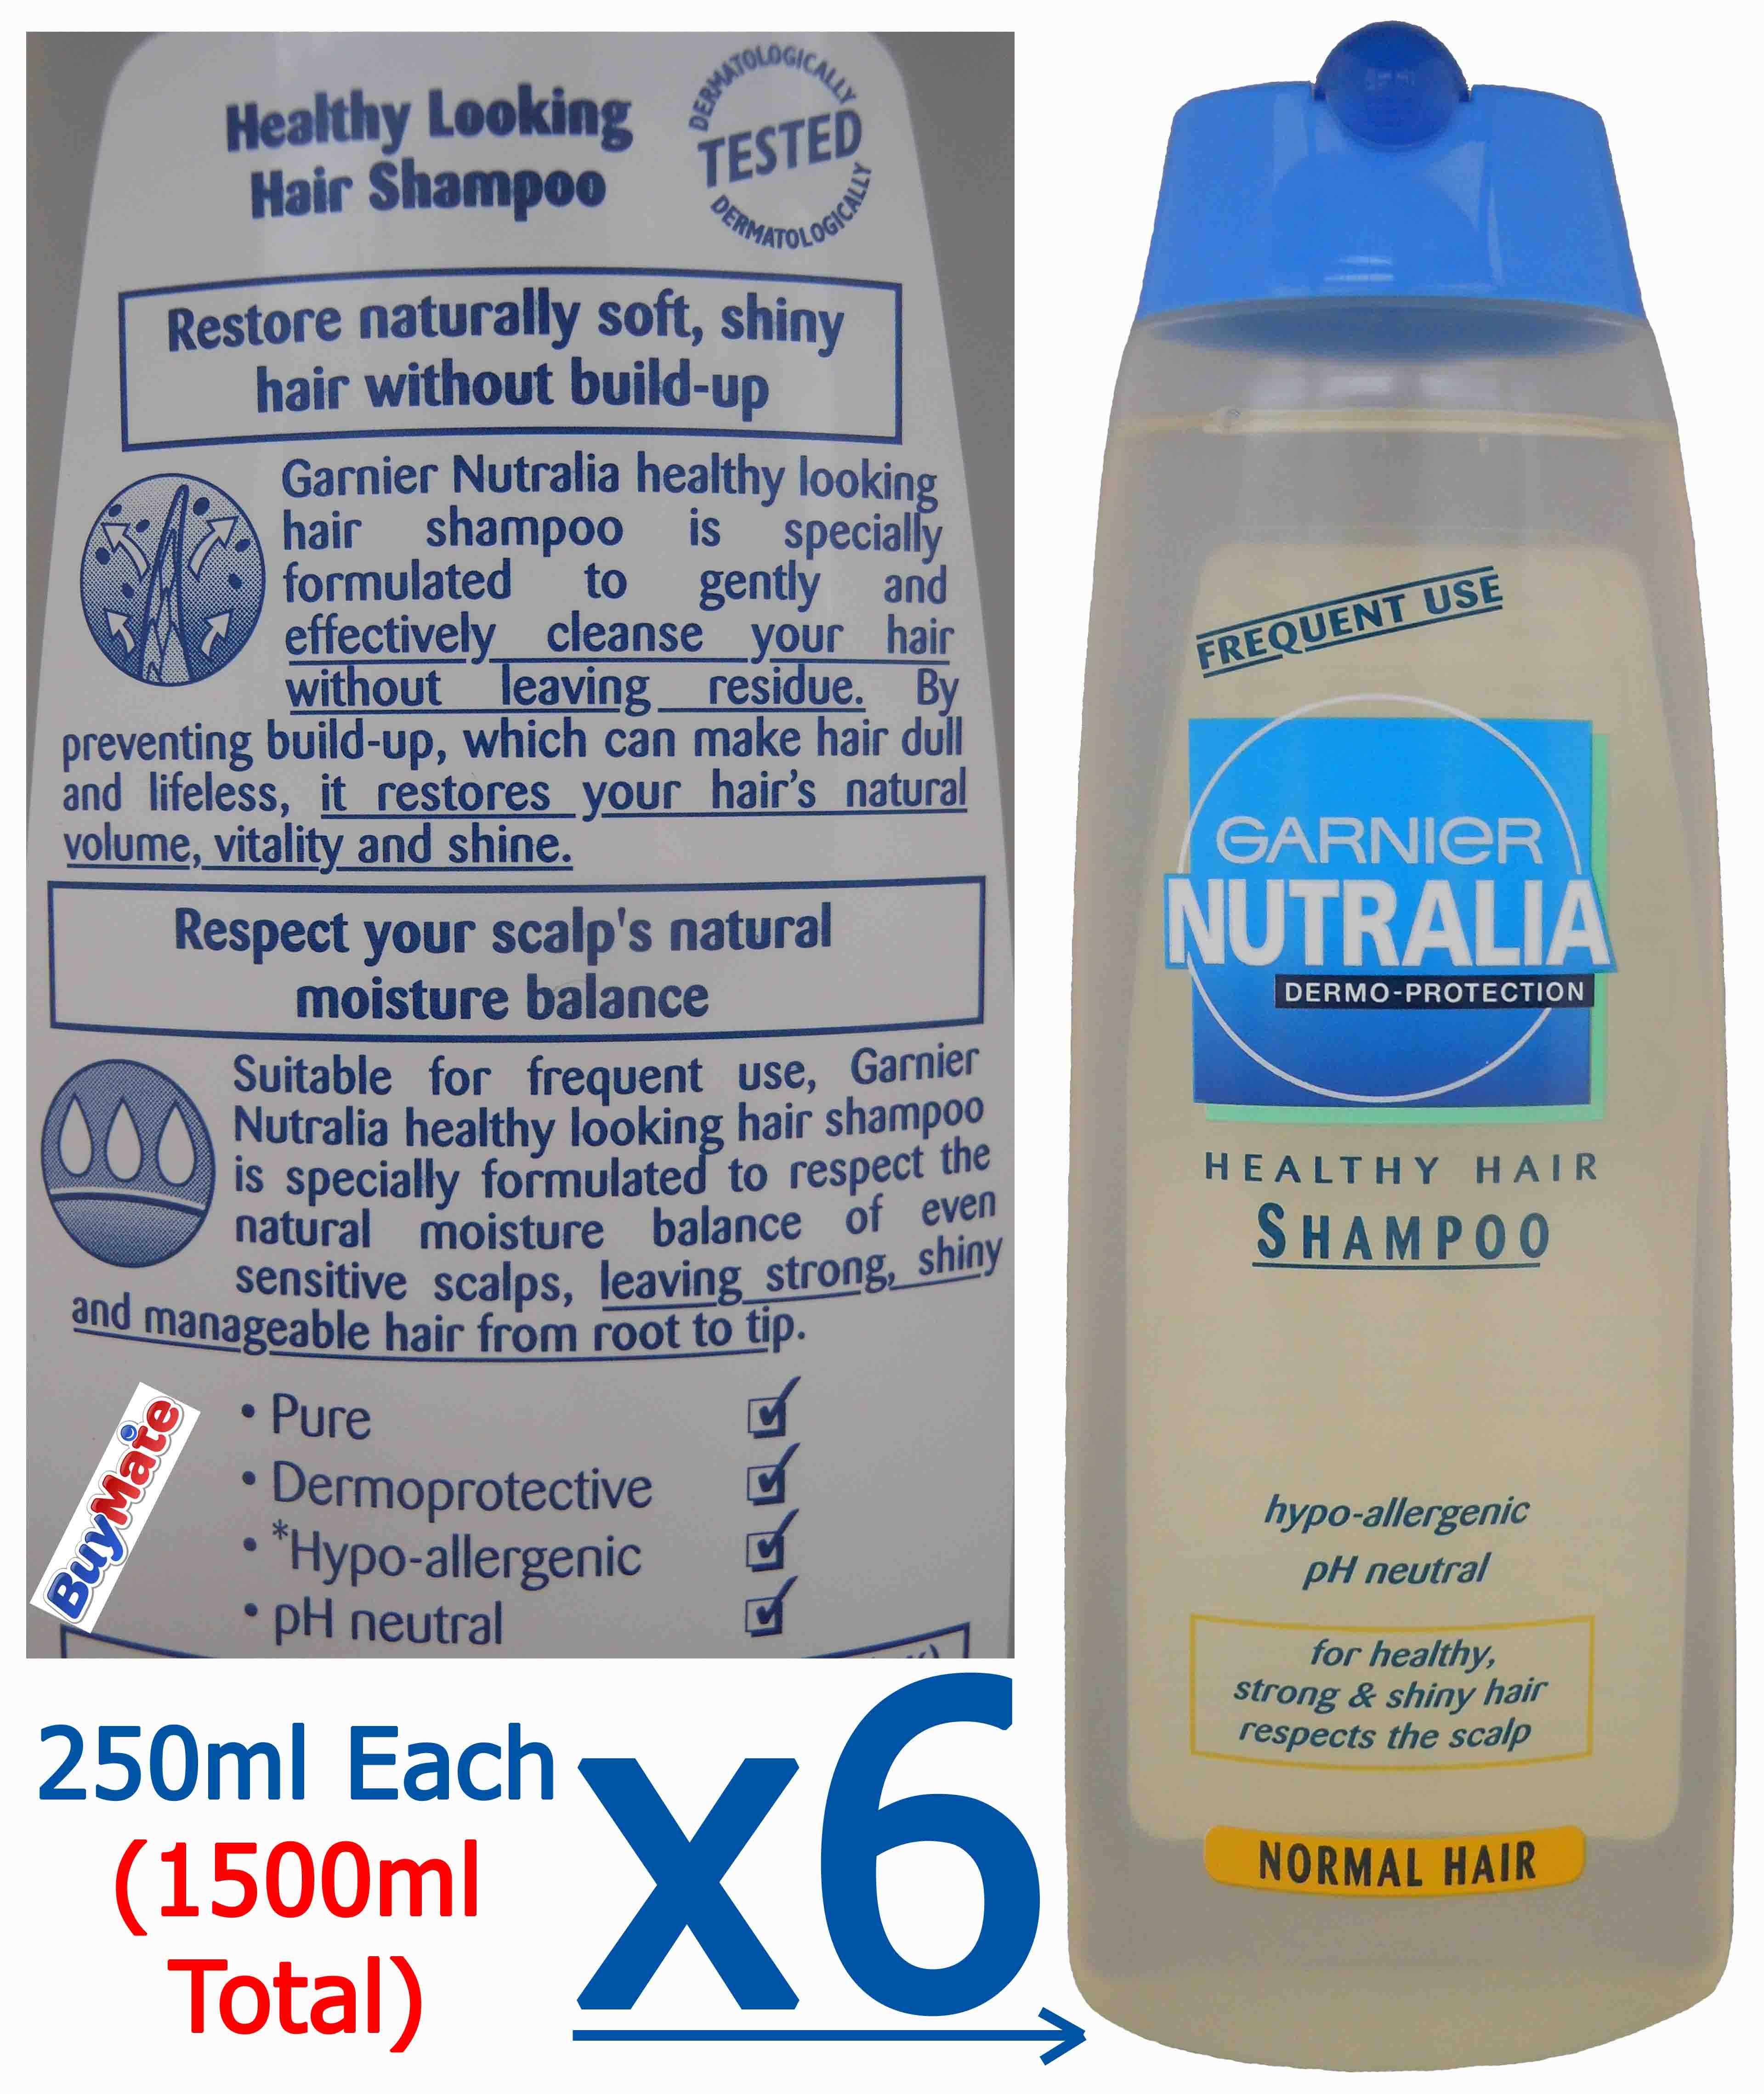 garnier nutralia dermo protection healthy hair shampoo for. Black Bedroom Furniture Sets. Home Design Ideas